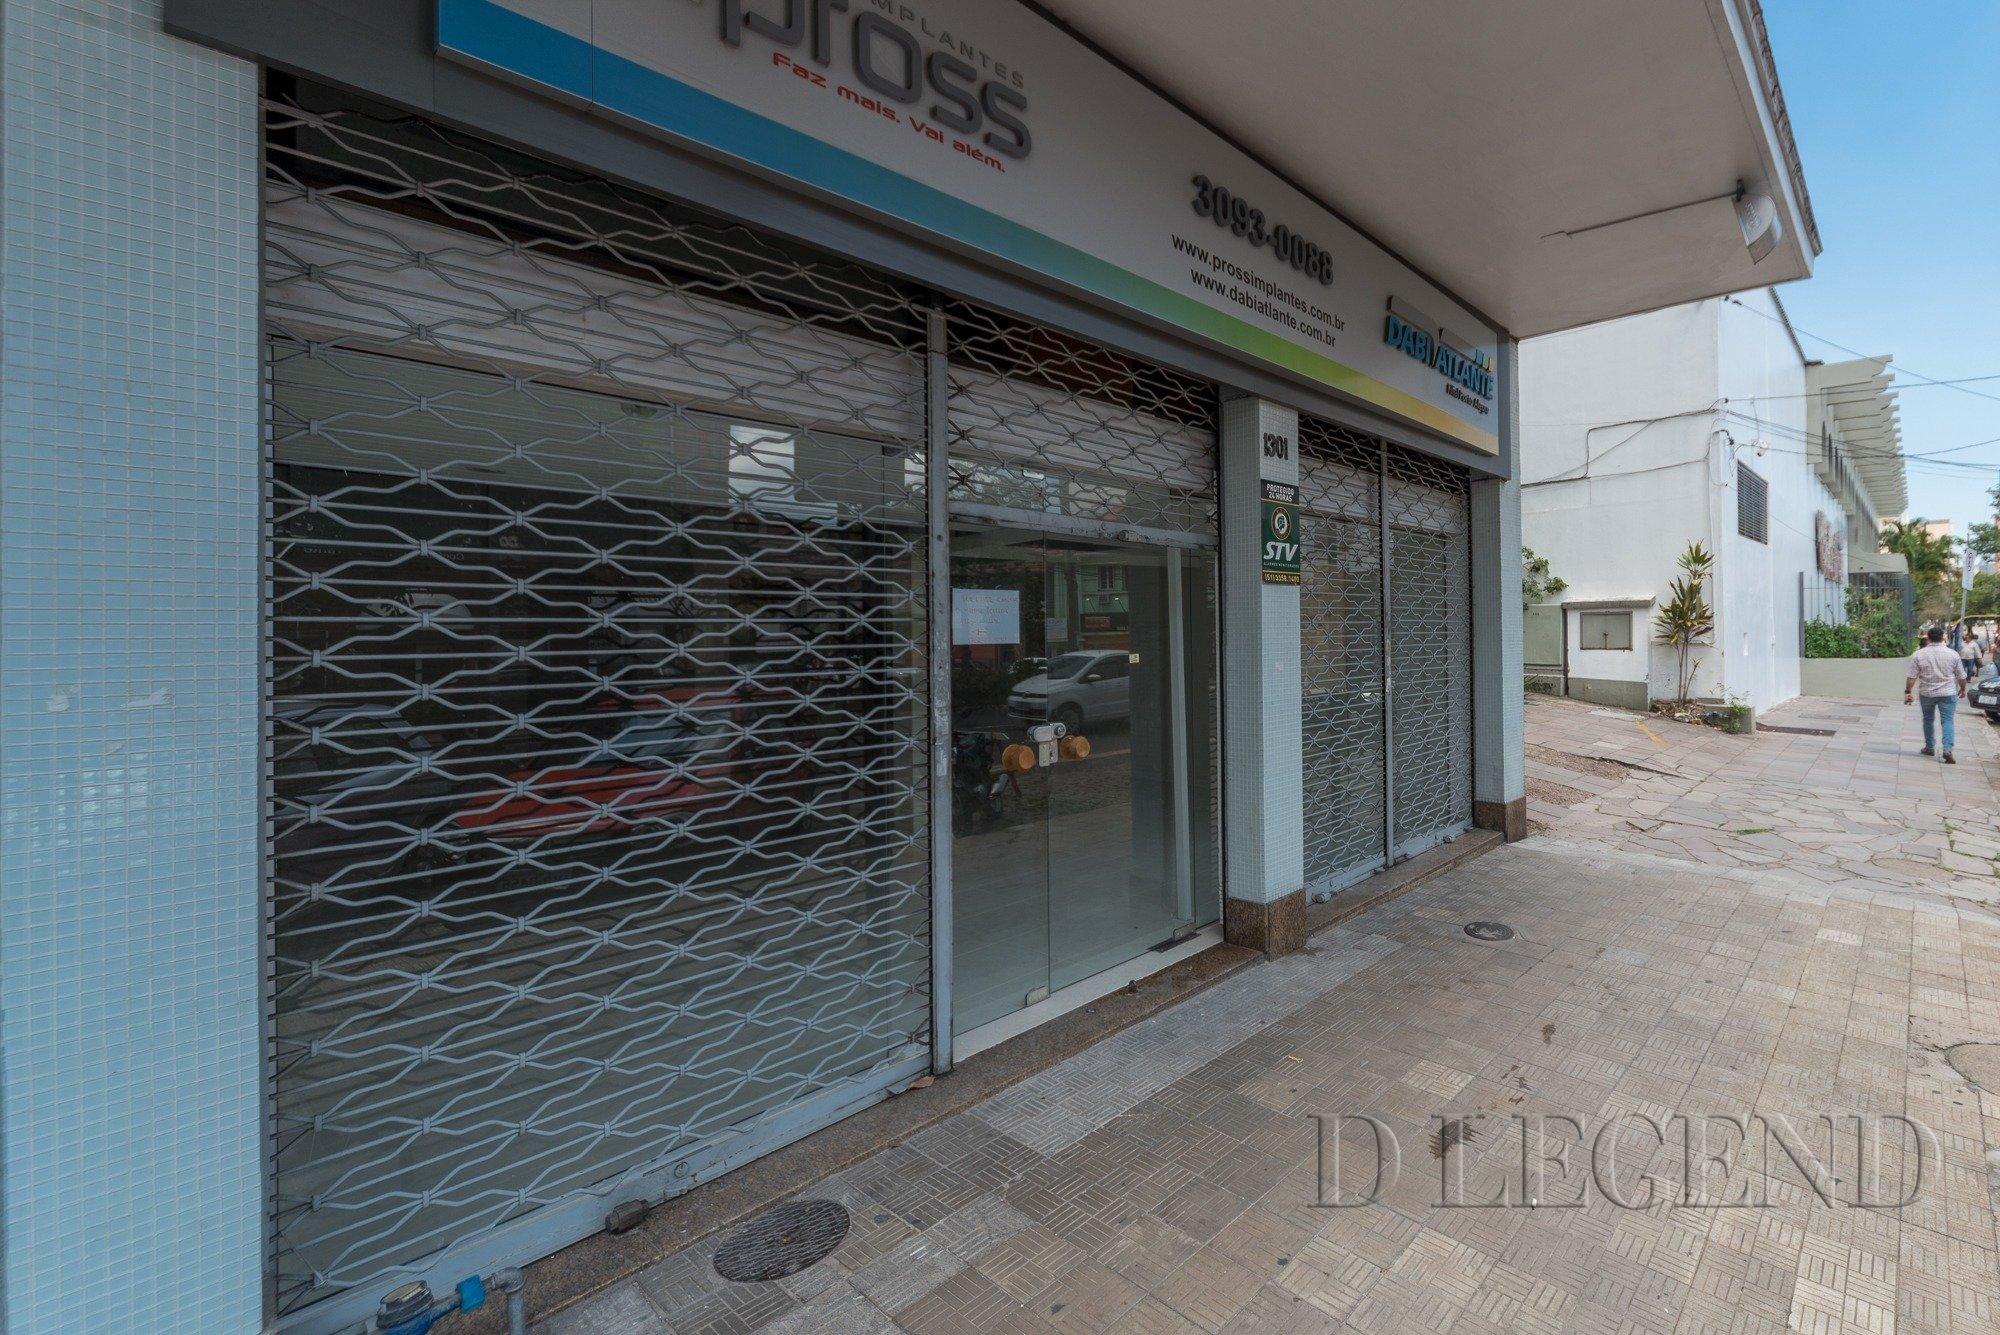 INTERLAGOS GRANDE VITRINE PARA SEU NEGÓCIO - Avenida Cristovao Colombo, 1301 - Floresta - Porto Alegre